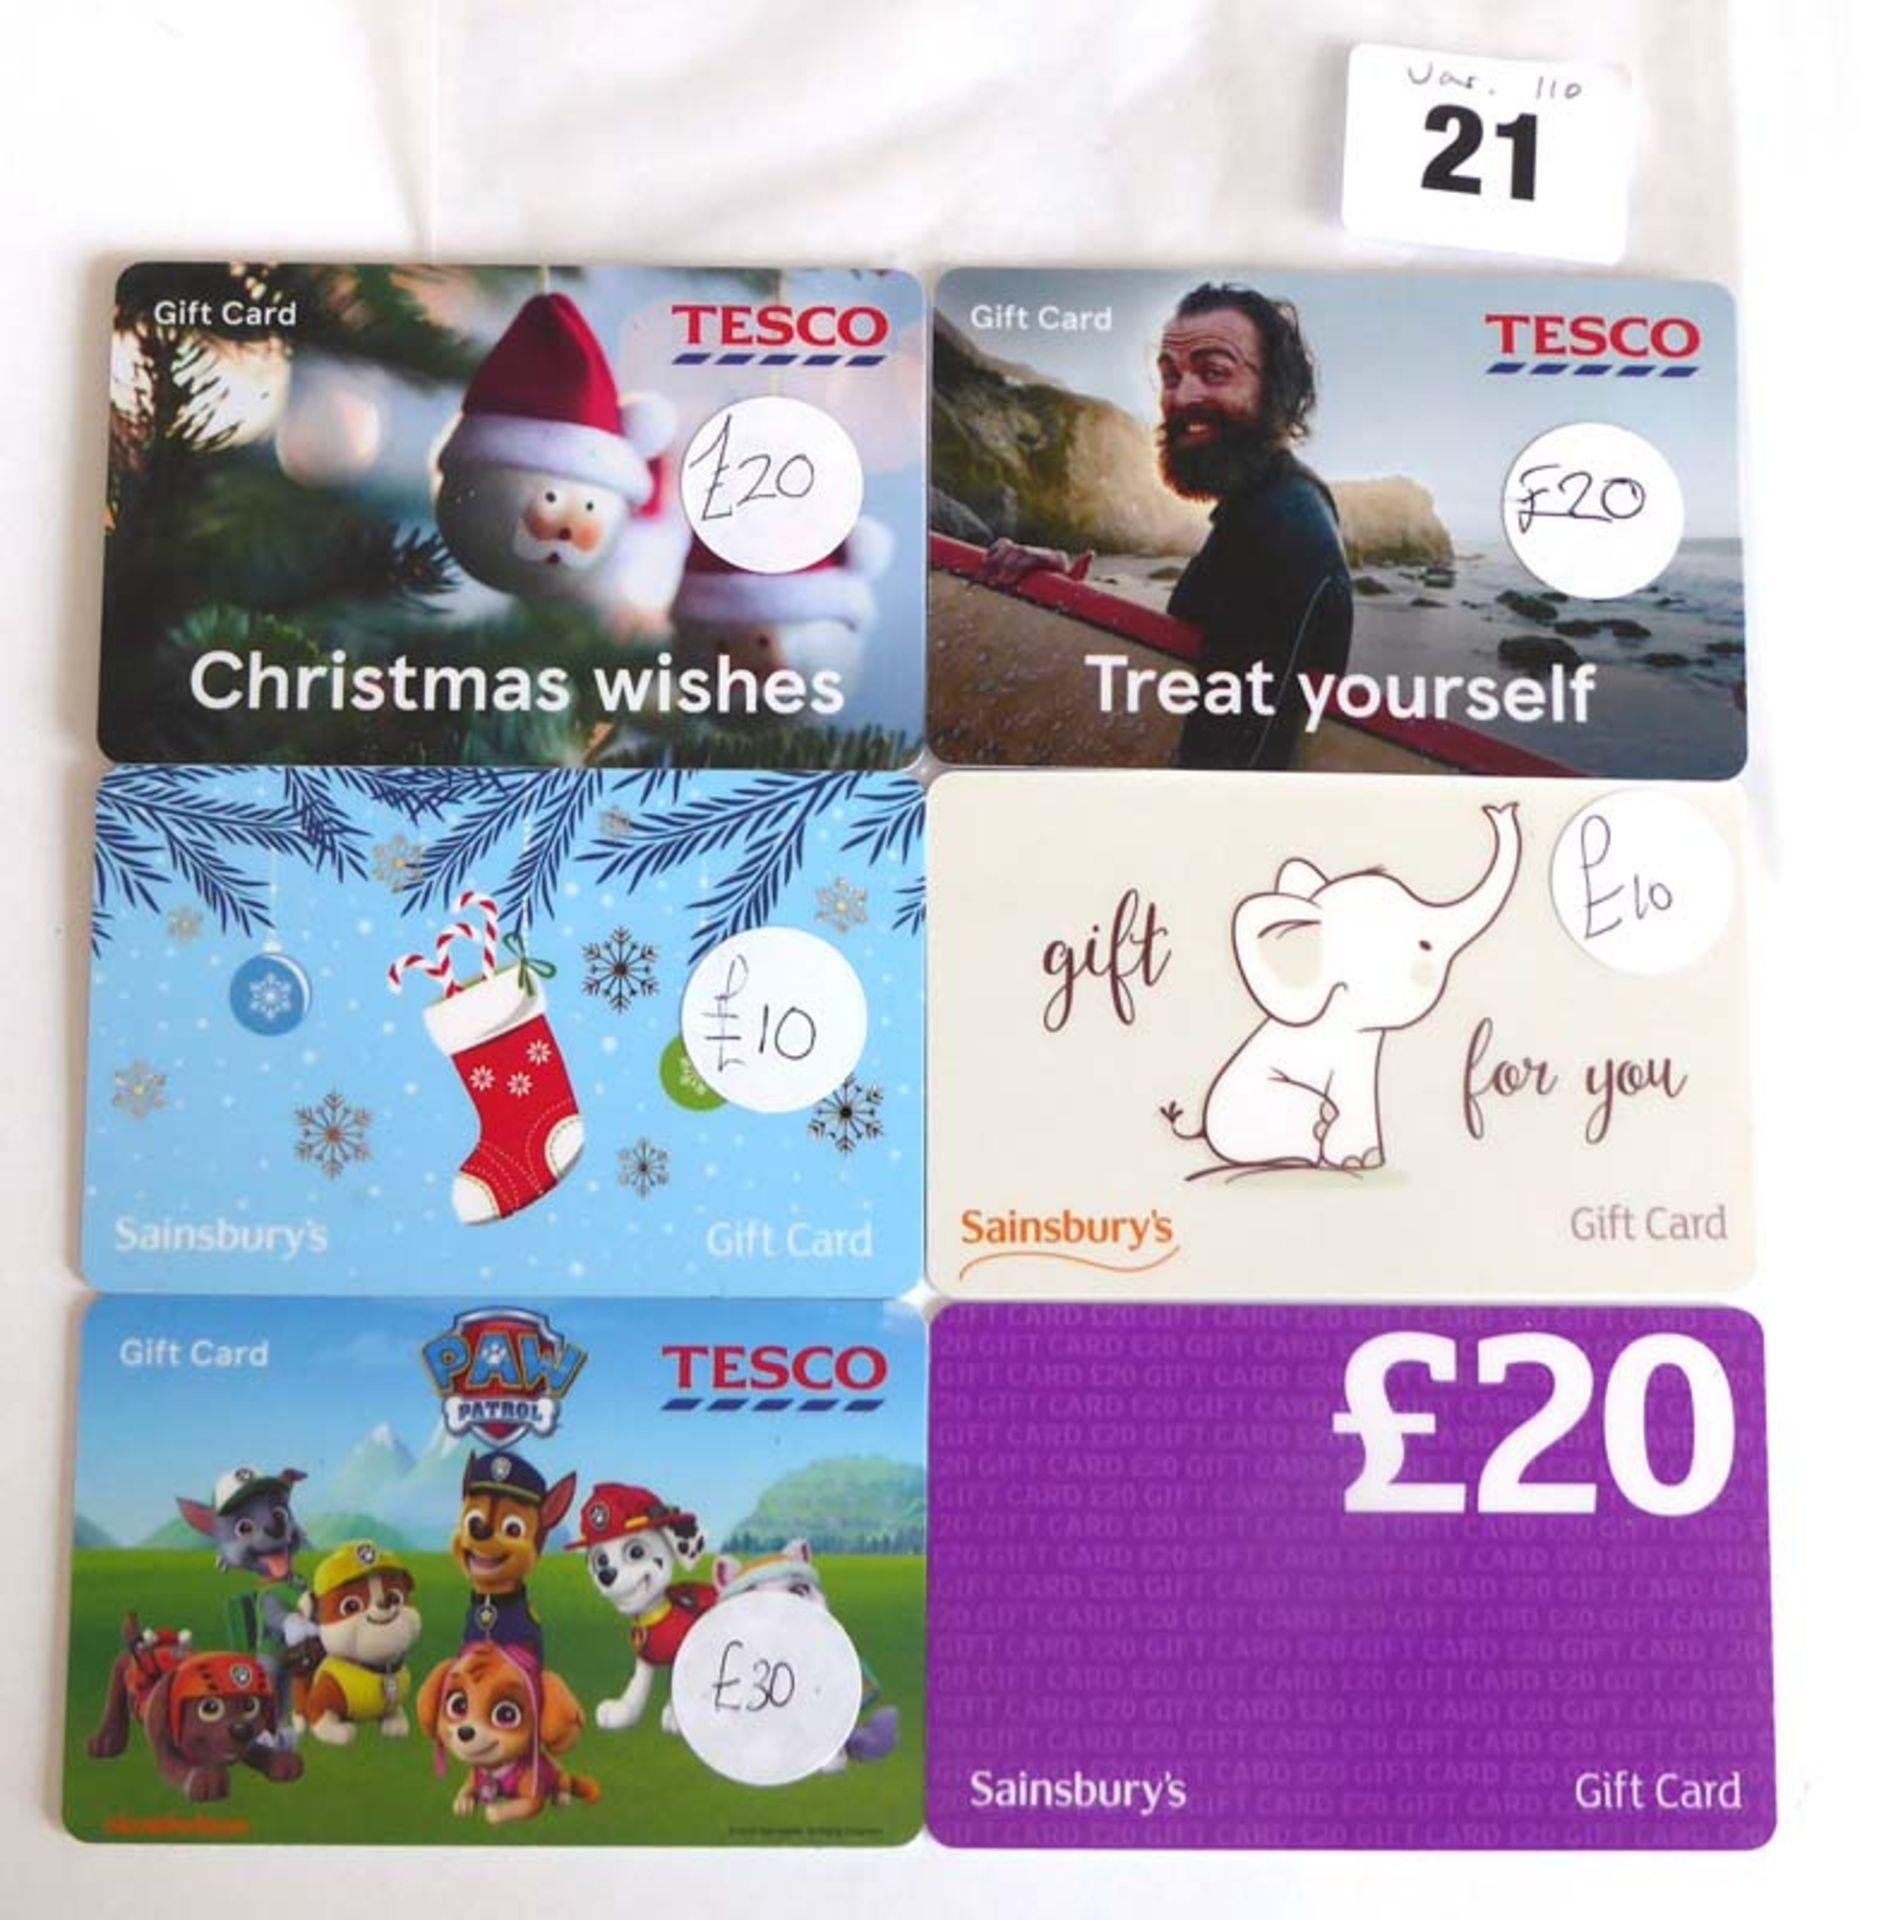 Lot 21 - Sainsbury (x5) - Total face value £80